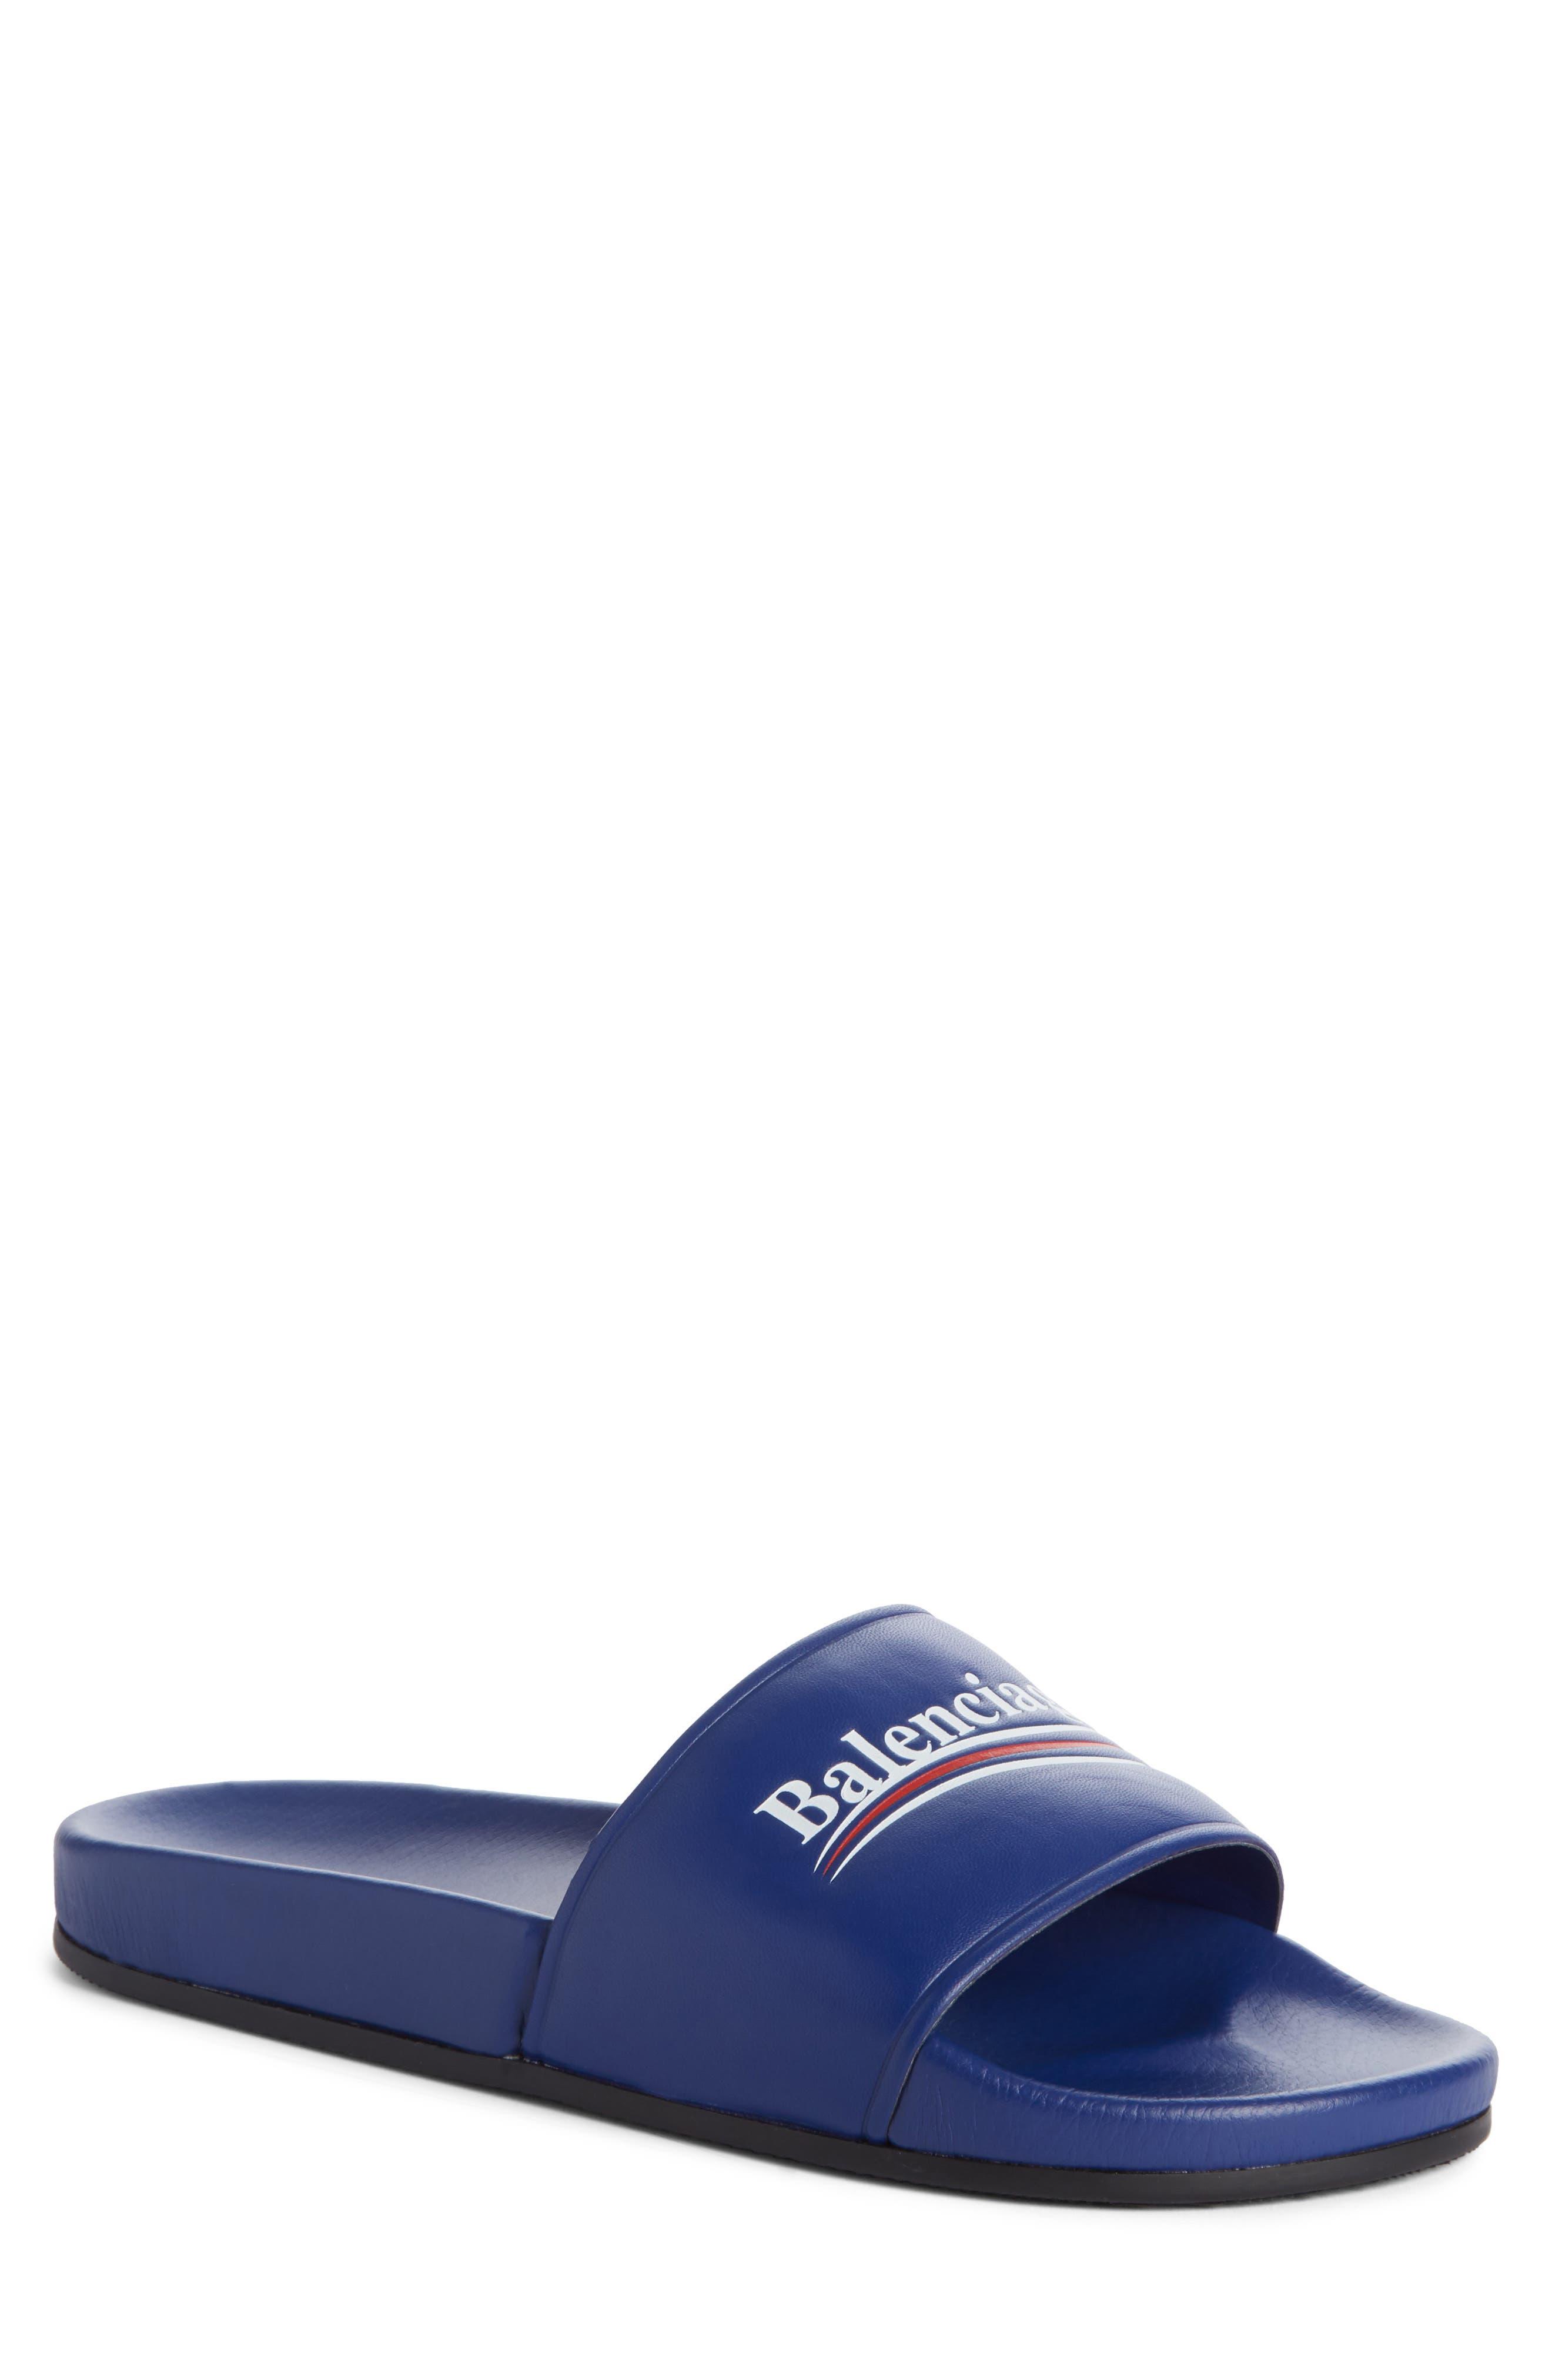 Main Image - Balenciaga Retro Logo Slide Sandal (Men)